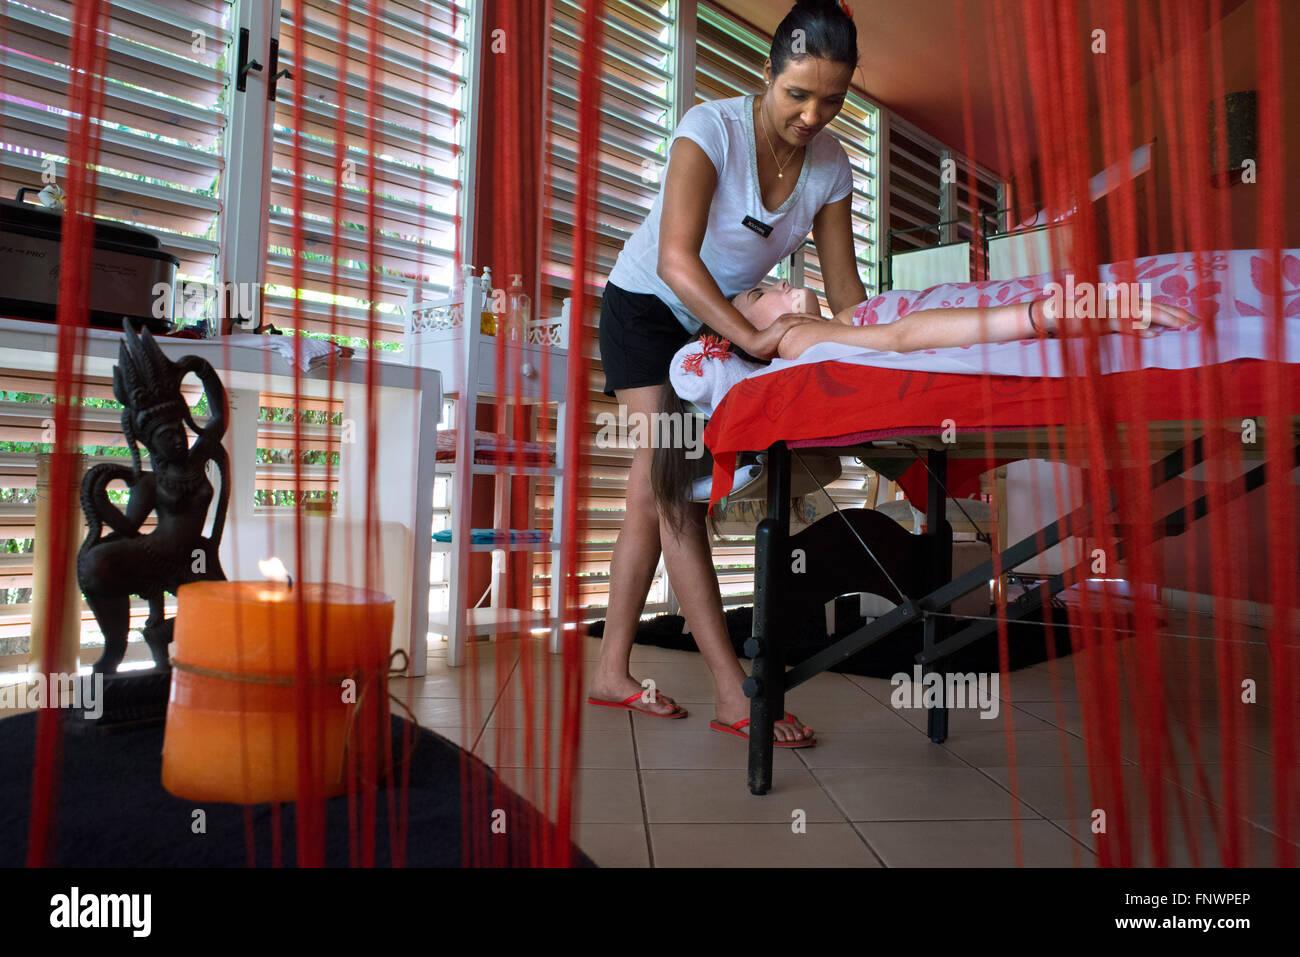 Spa, wellness, massages in Meridien Hotel on the island of Tahiti, French Polynesia, Tahiti Nui, Society Islands, Stock Photo